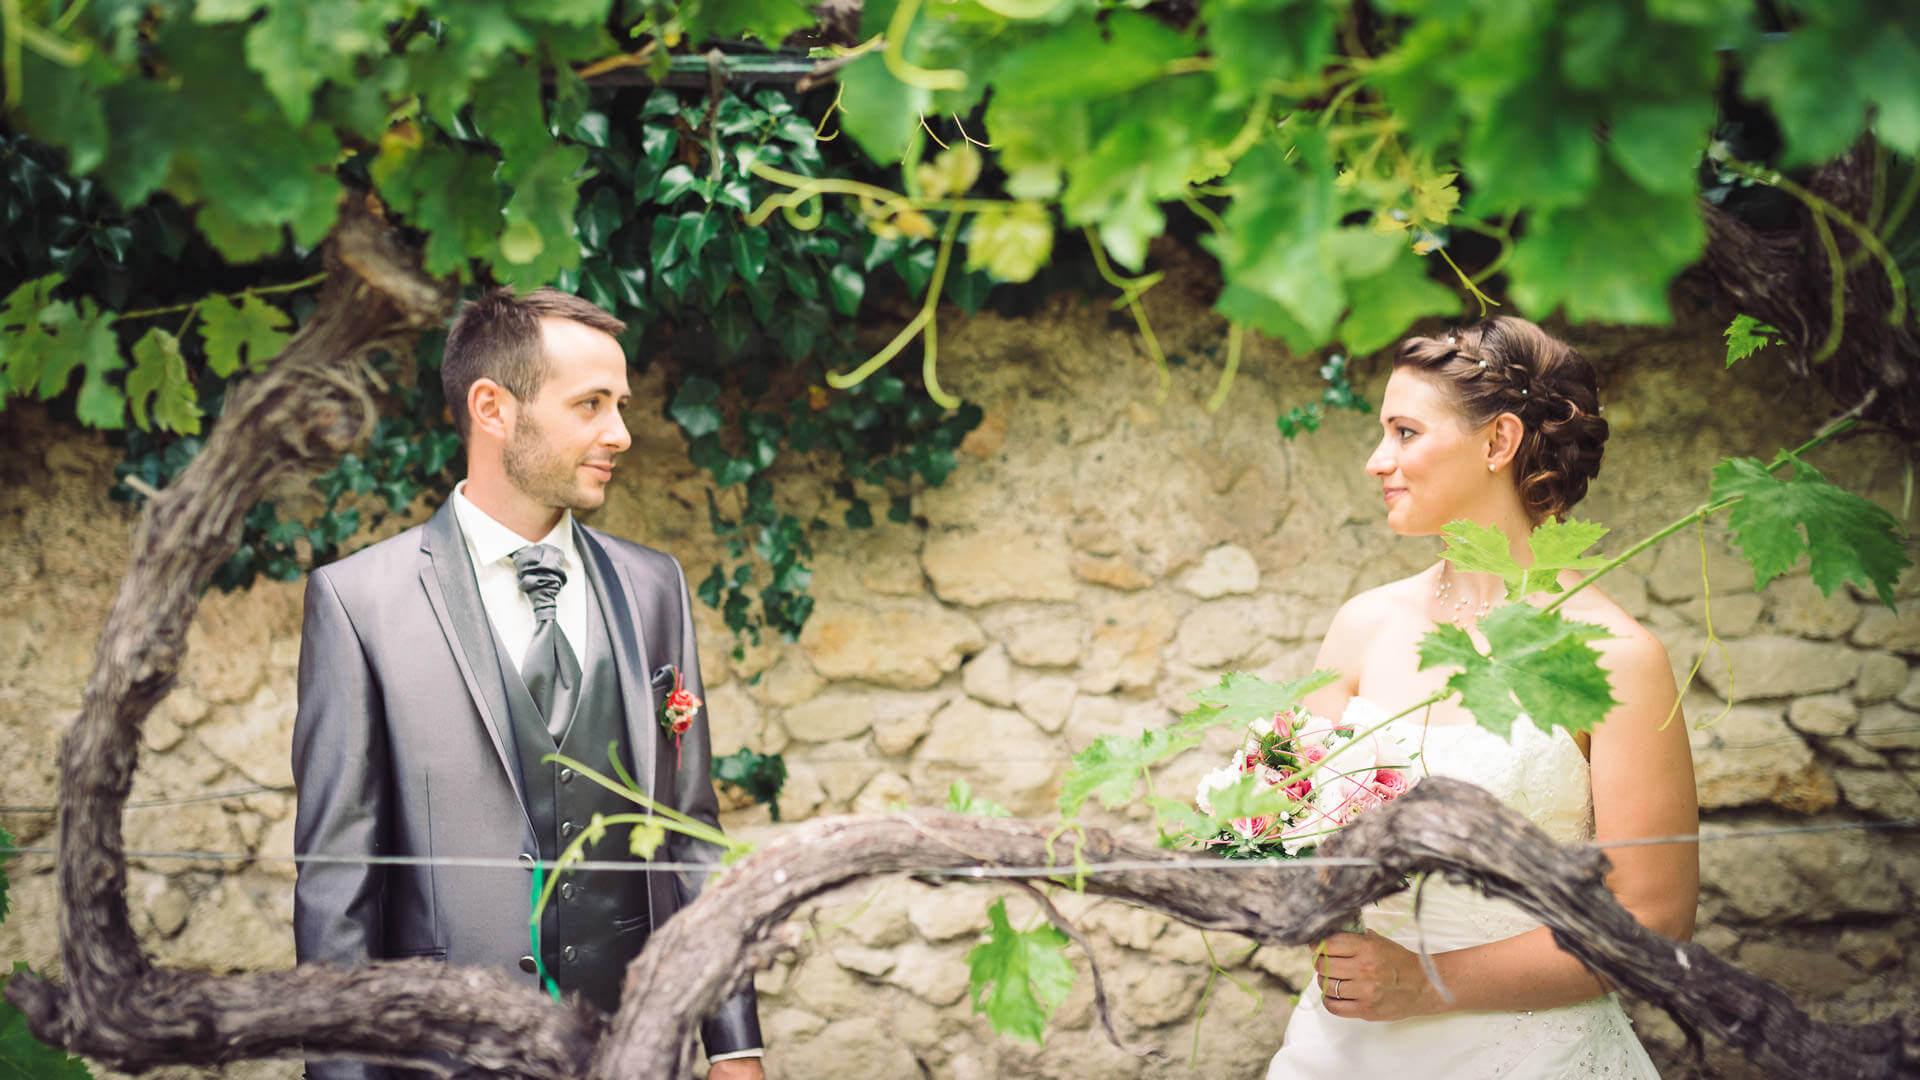 photographe mariage boheme chic studio graou montpellier